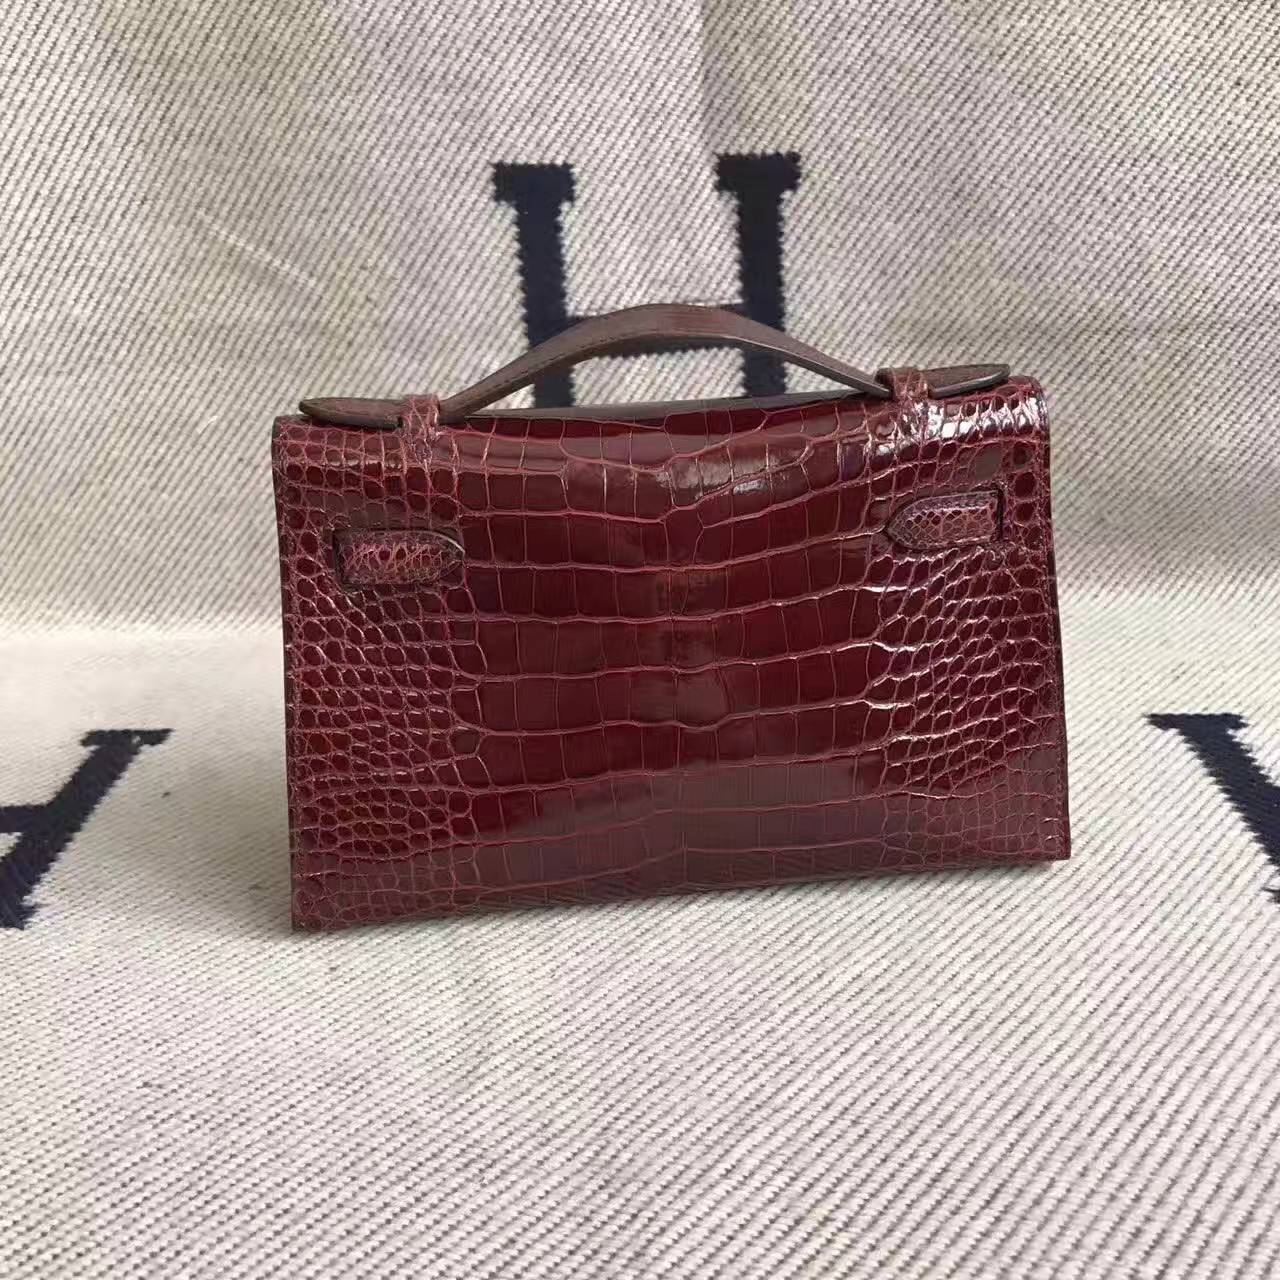 Sale Hermes CK57 Bordeaux Crocodile Shiny Leather Minikelly Bag 22cm